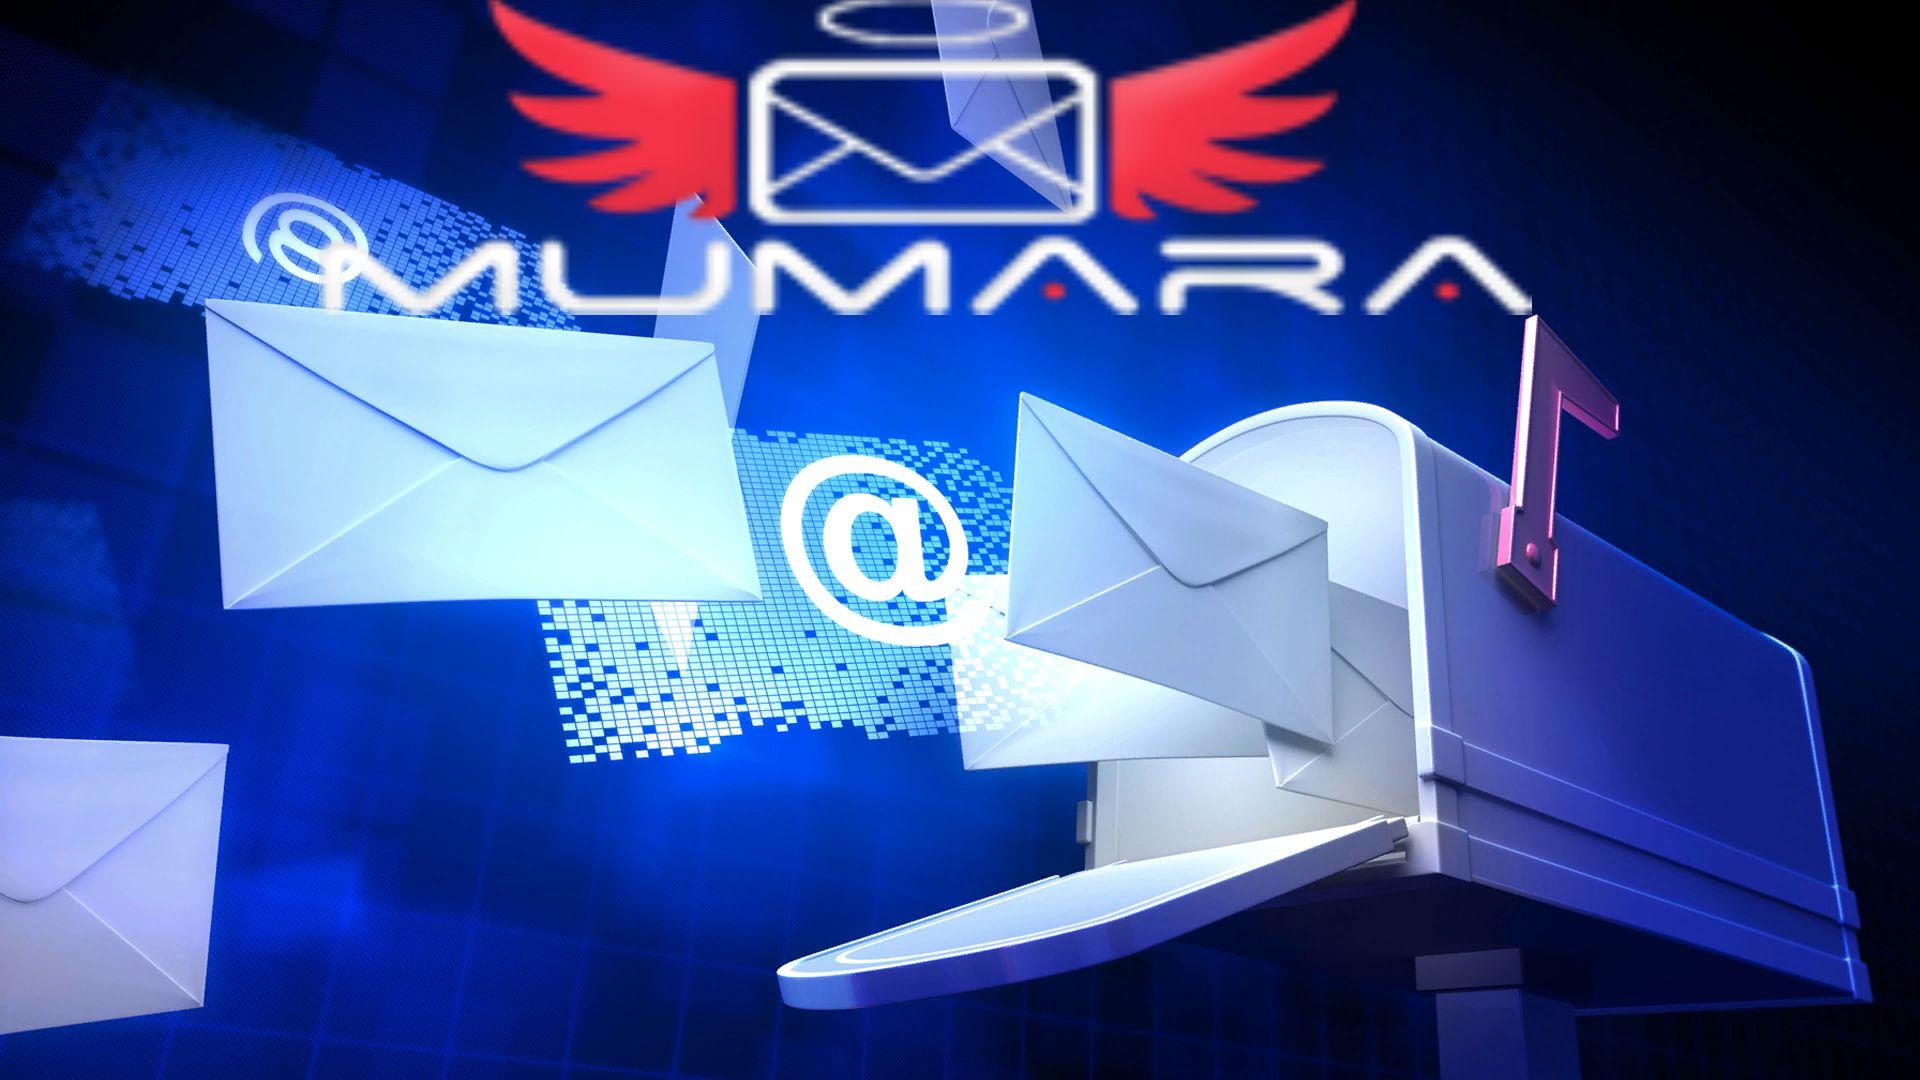 I will install bulk email marketing software-MUMARA latest version with PowerMTA 5.0r3